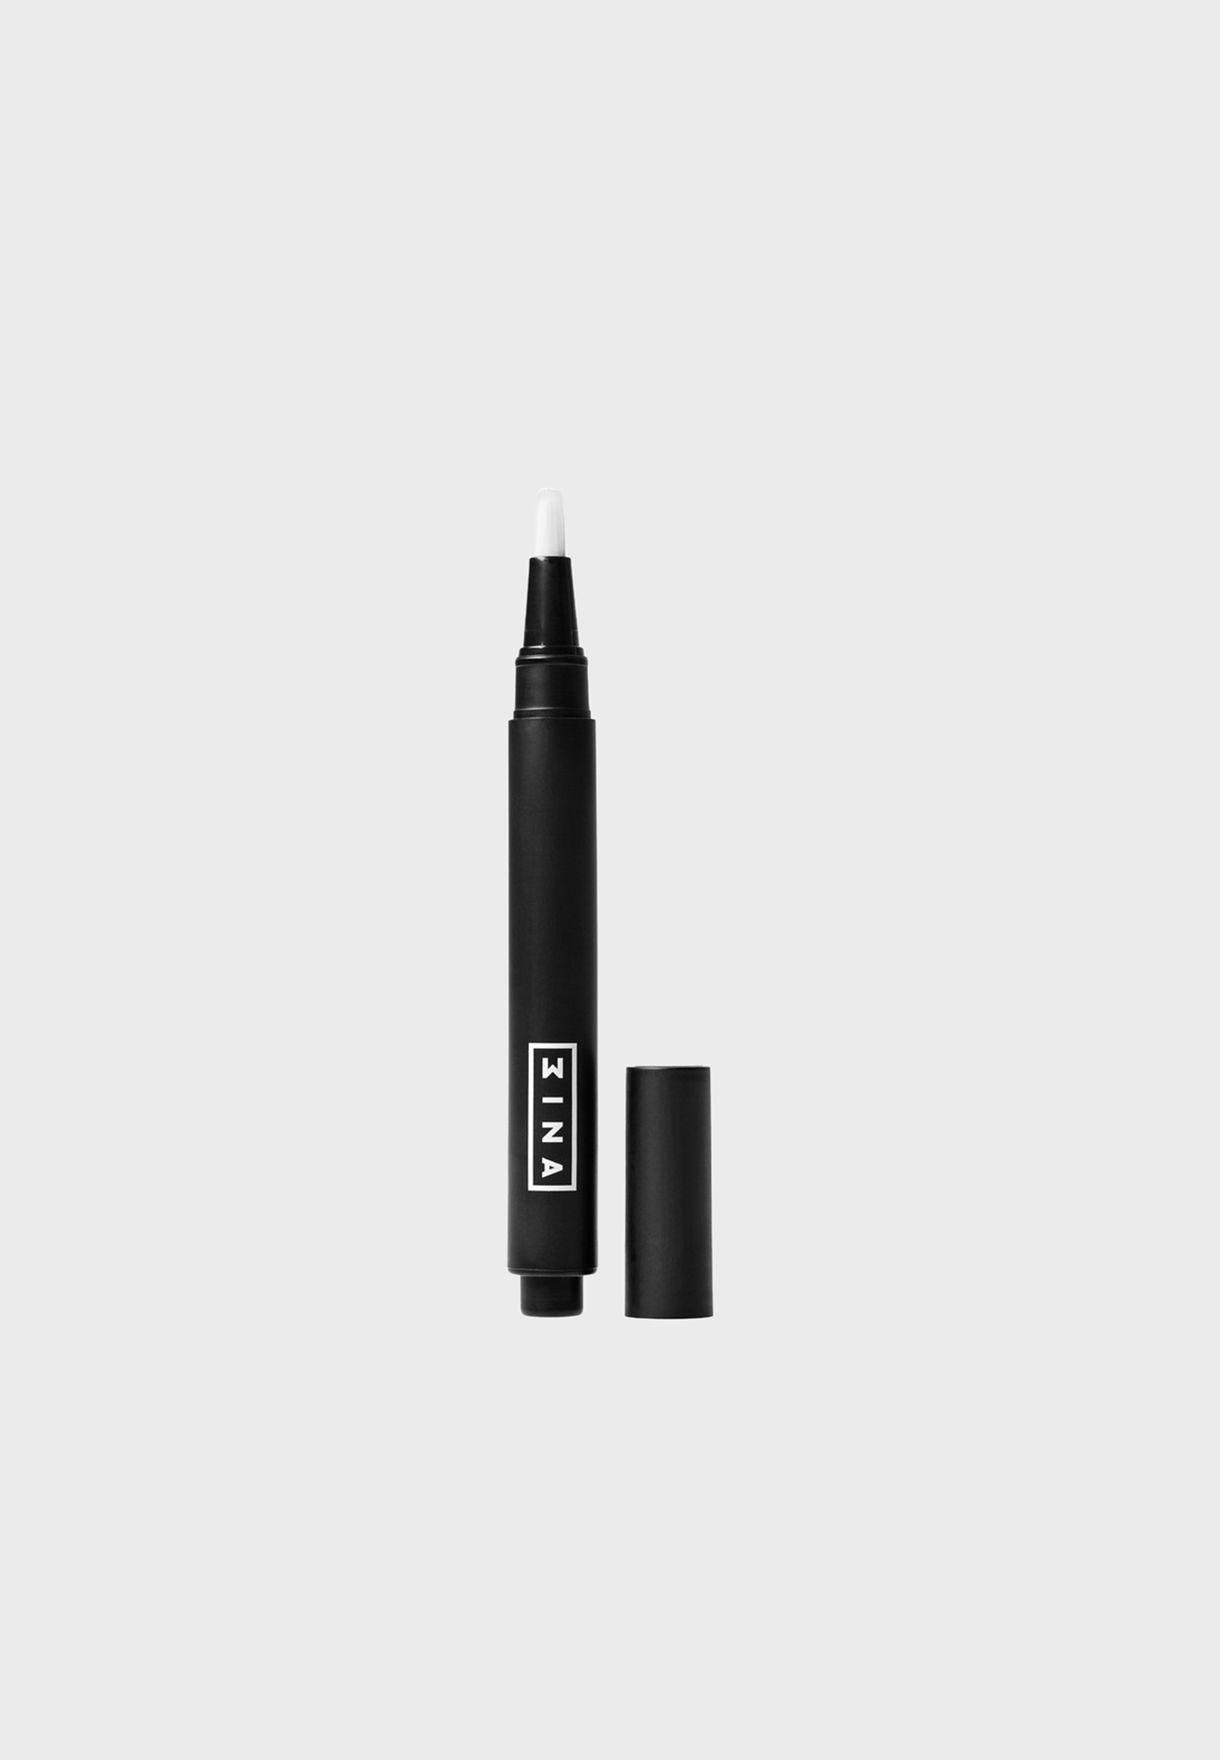 قلم هاي لايتينج كونسيلر 202